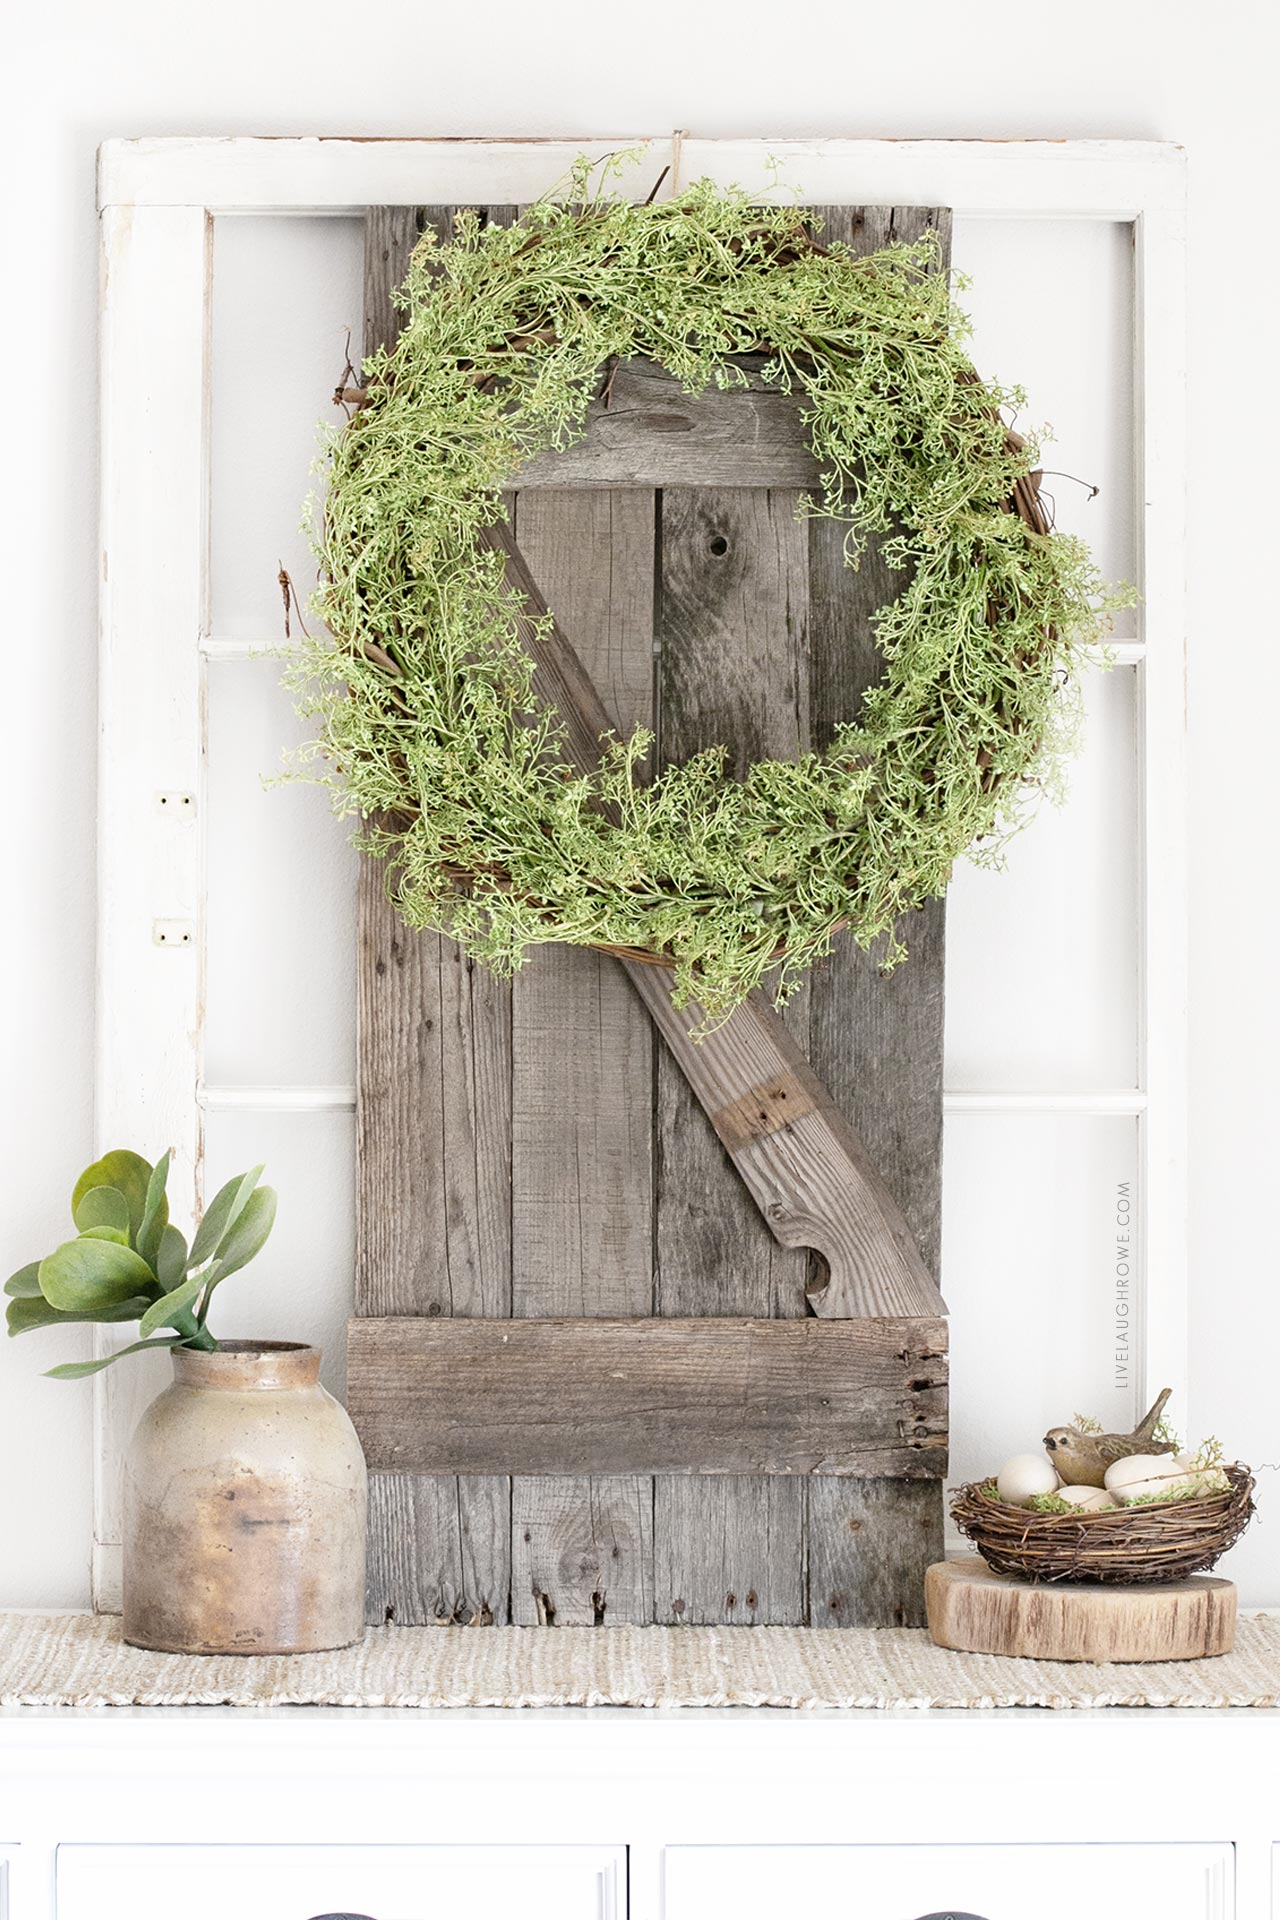 Garland Wreath hanging on Pallet Wood Shutter